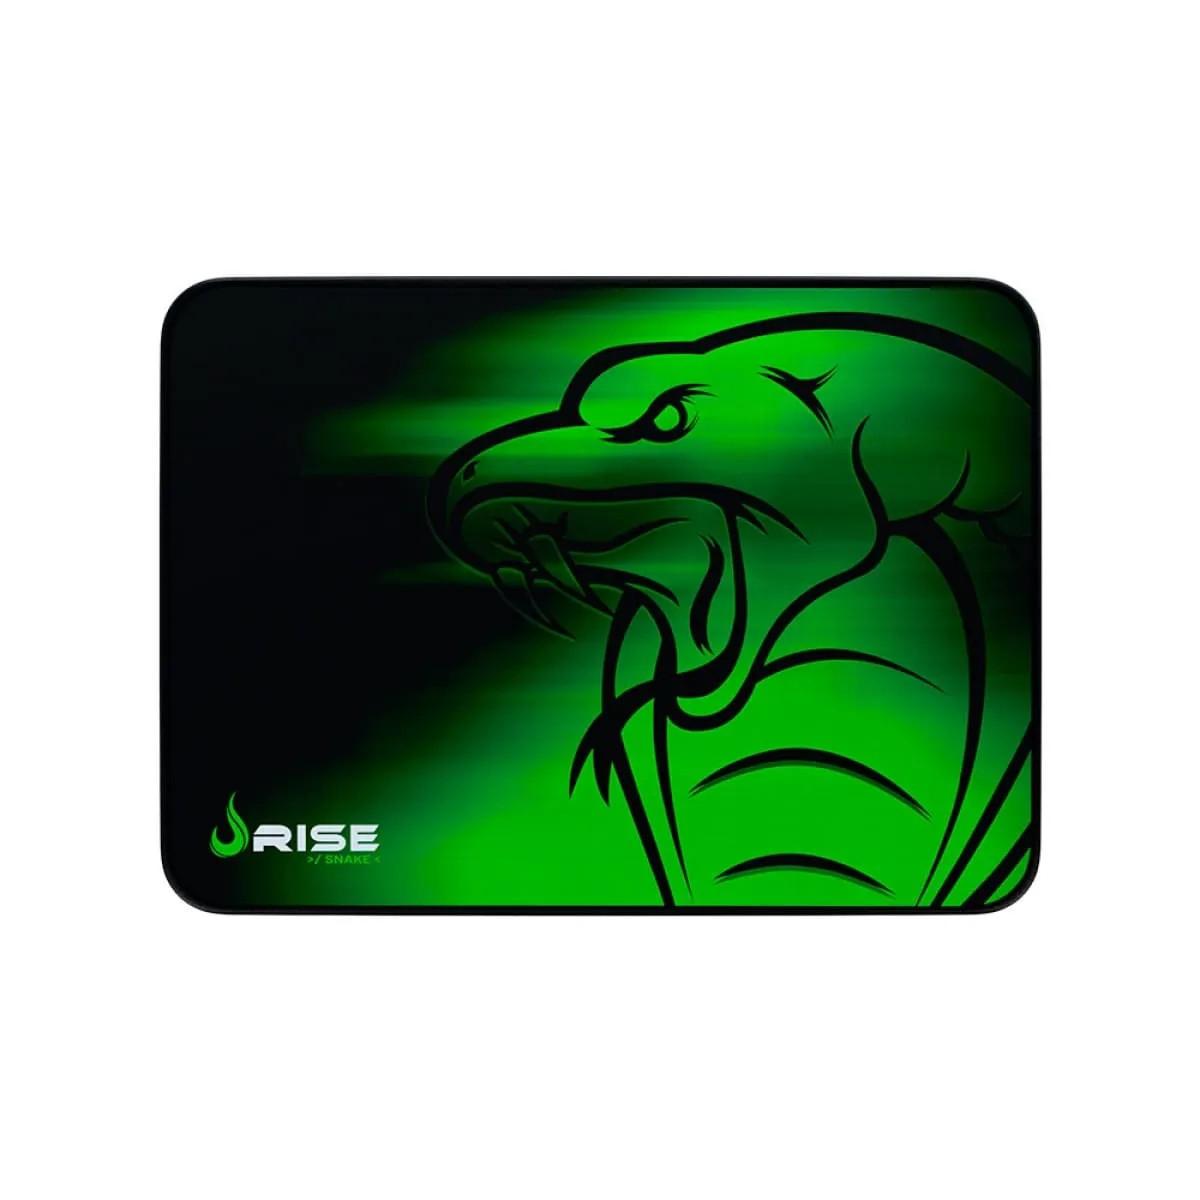 MousePad Gamer Snake Rise Médio 21x29 cm RG-MP-04-SE